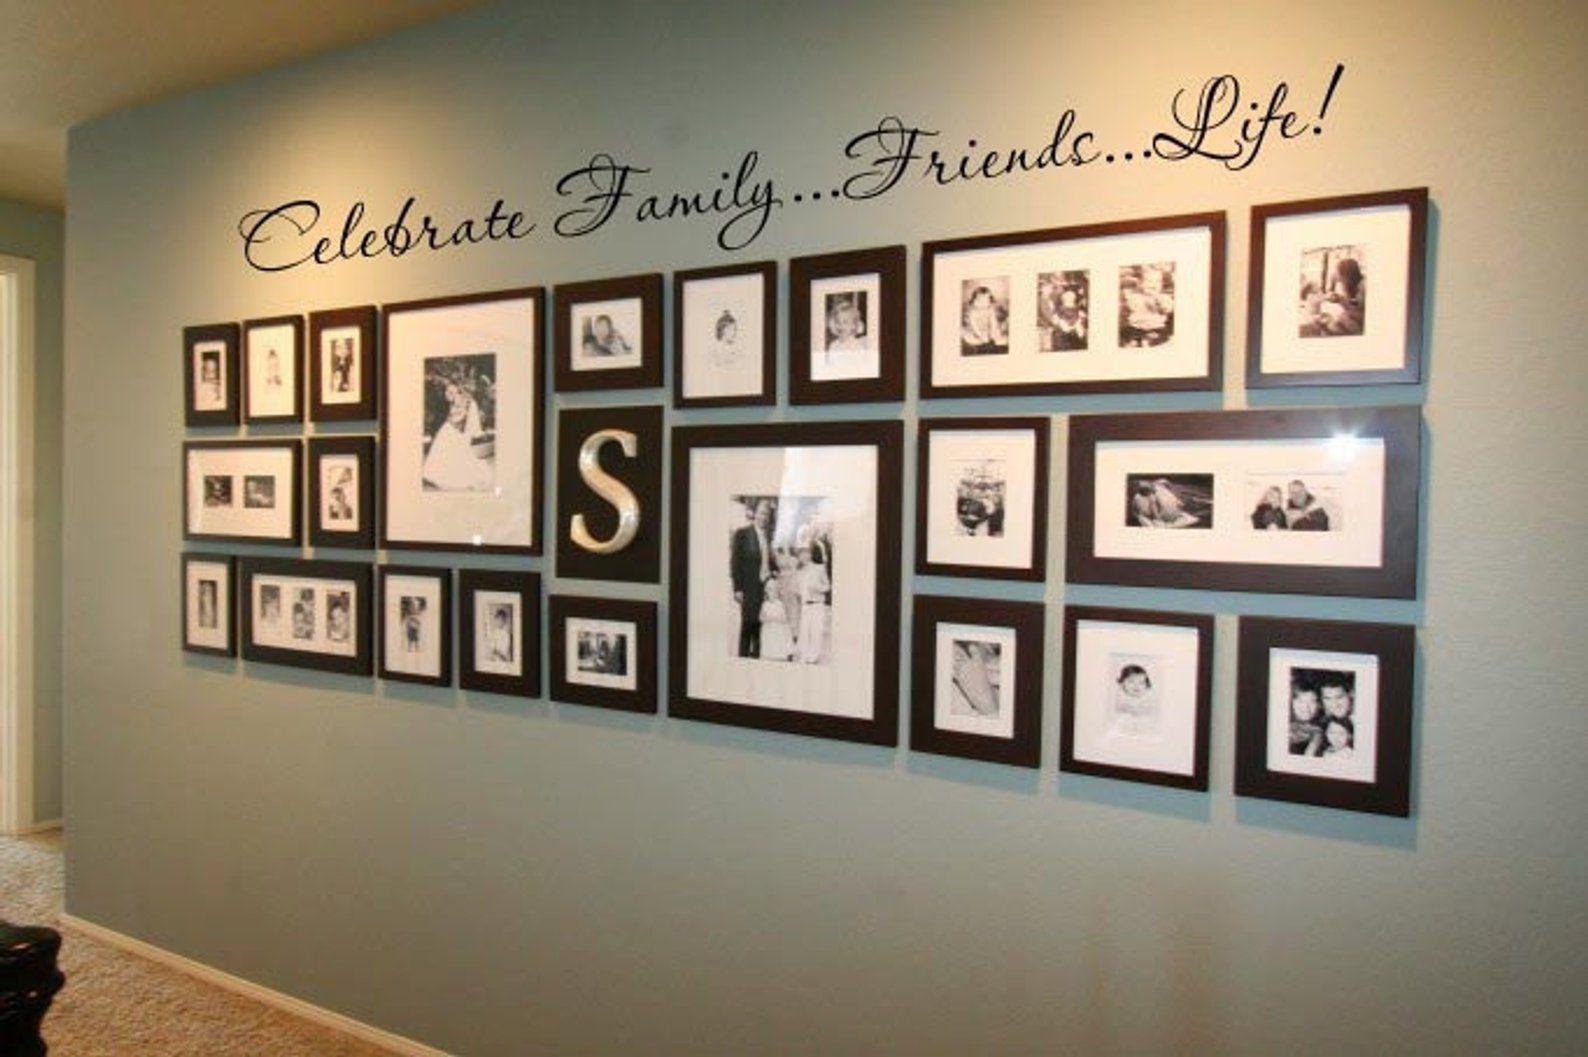 Celebrate Family...Friends...Life 52x5 Vinyl Decal Wall Art | Etsy